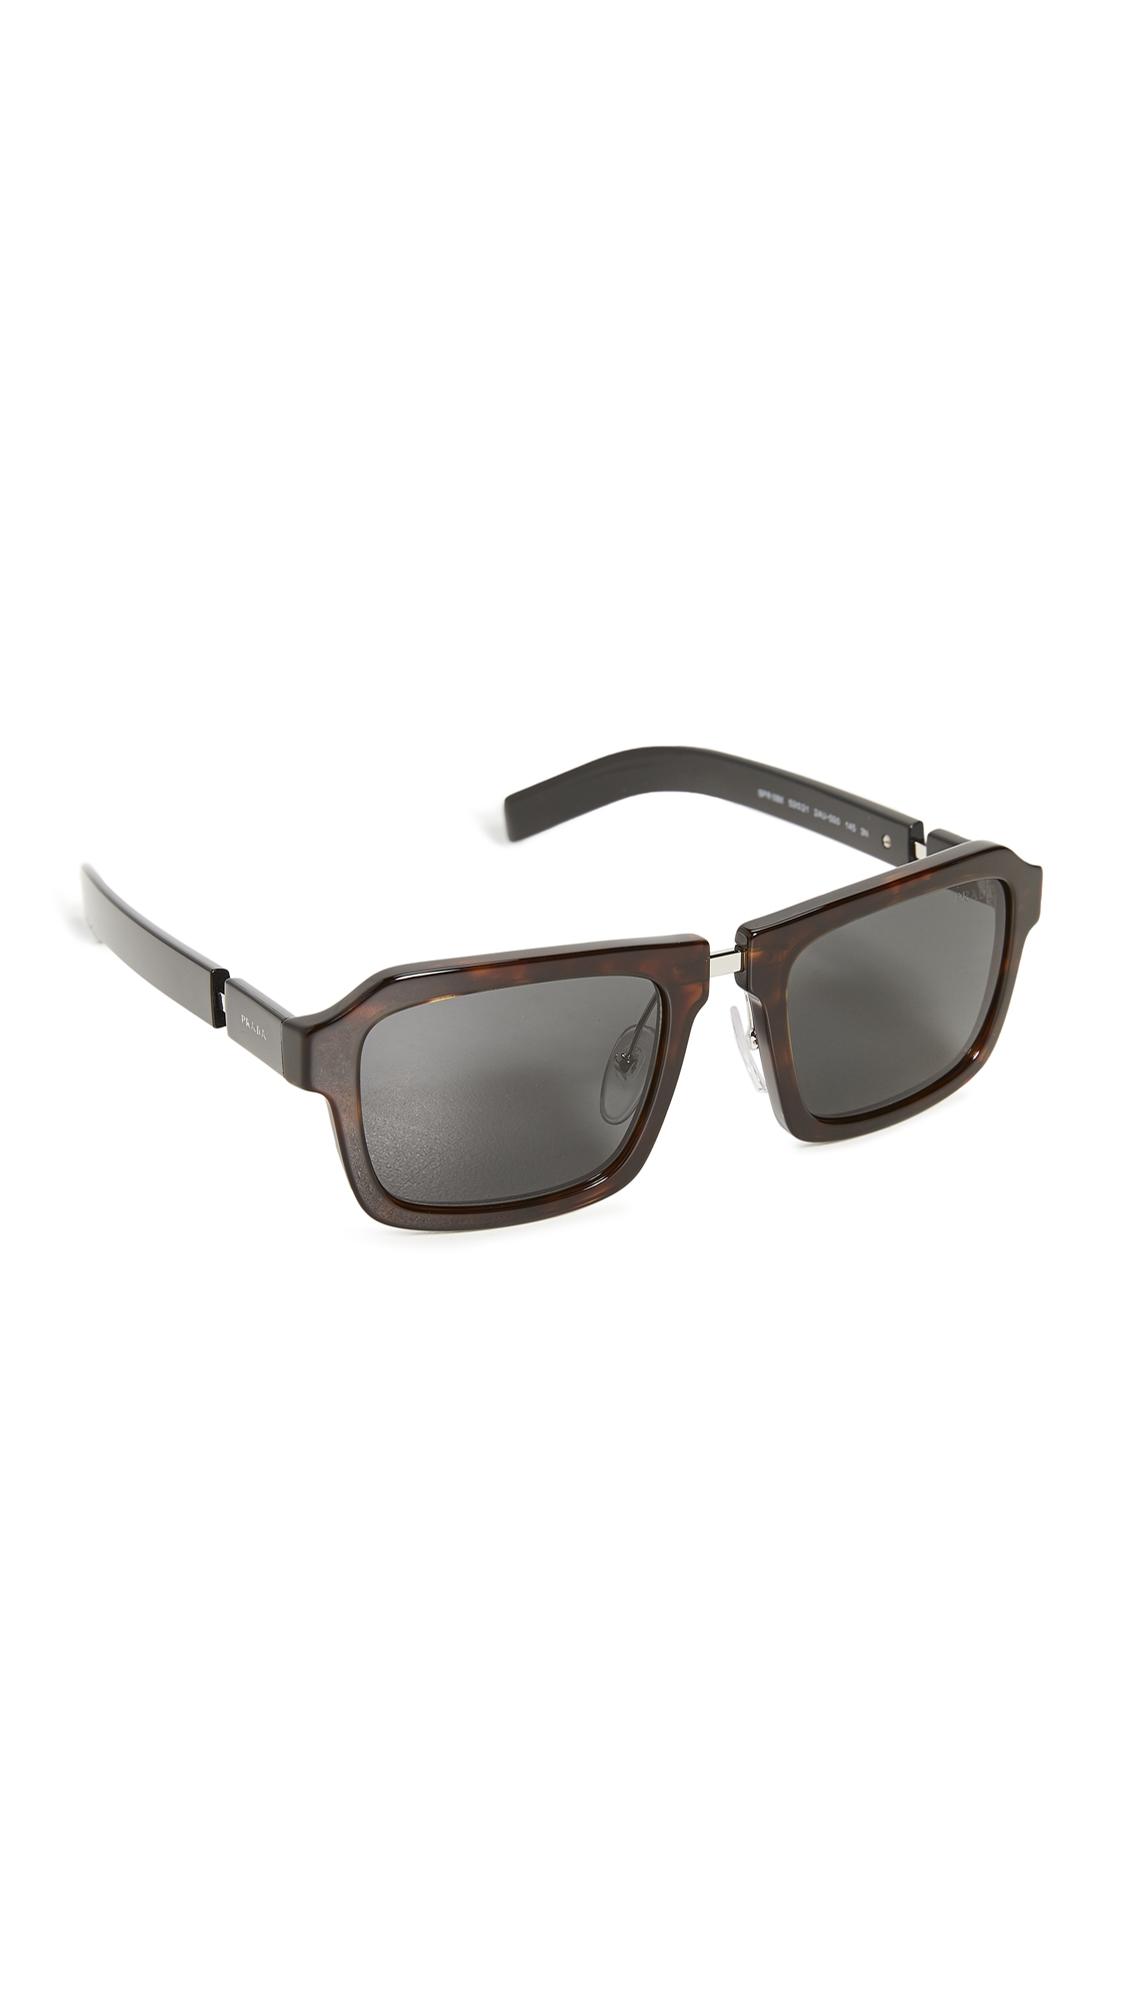 Prada Sunglasses 0PR 09XS SUNGLASSES